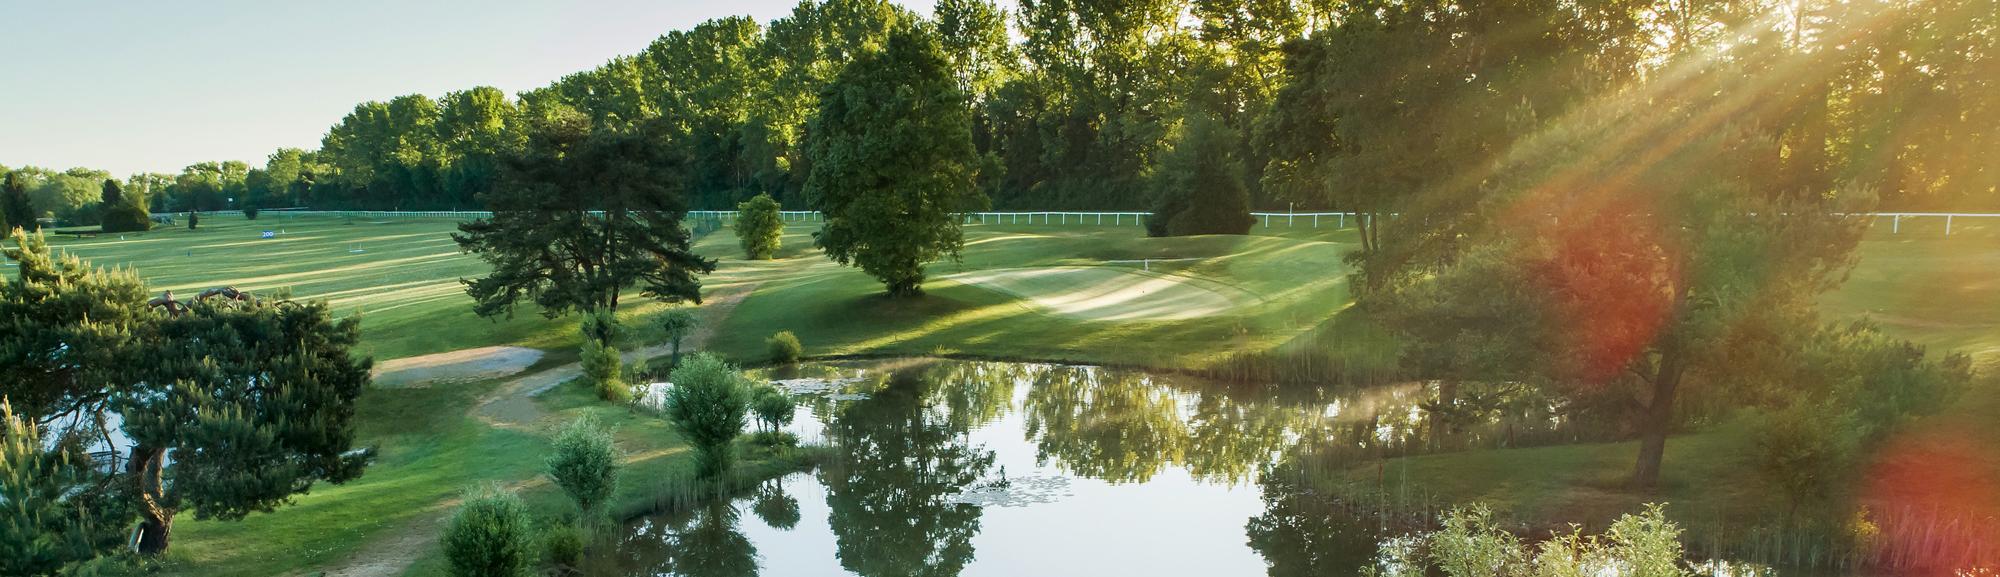 Golfclub München Riem